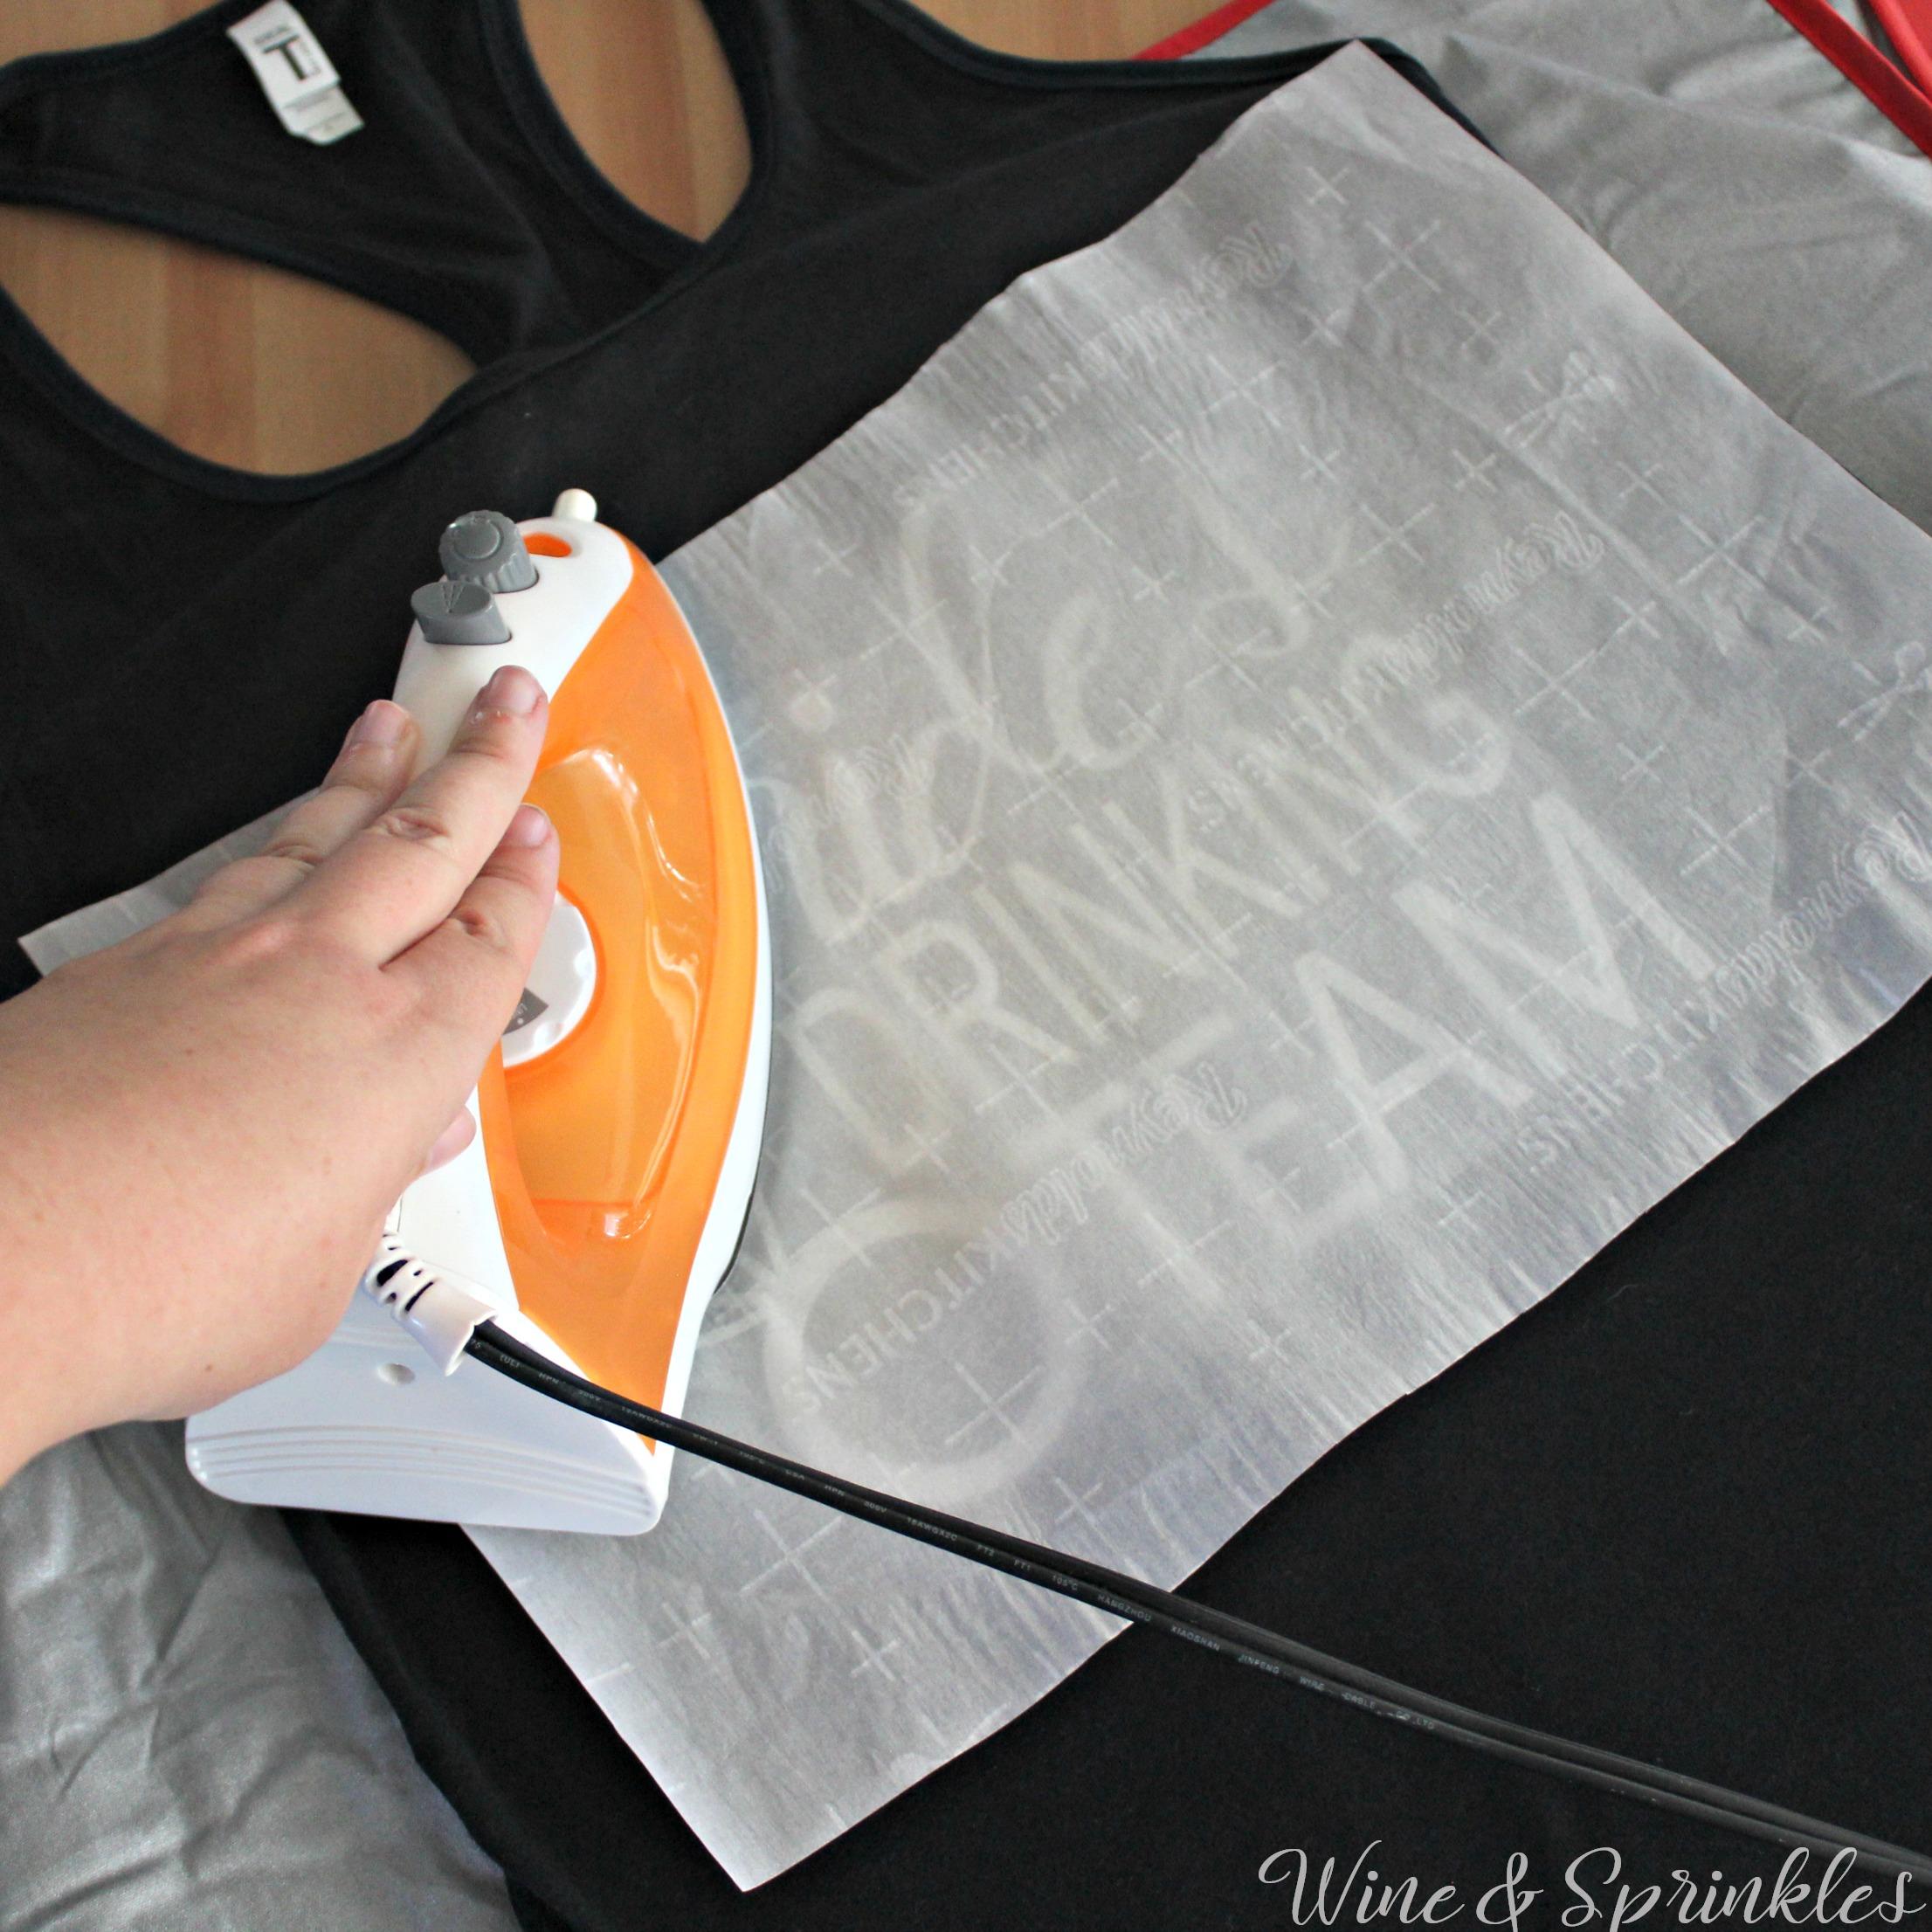 Free Cut Files! - DIY Iron On Brides Drinking Team Bachelorette Tank Tops #diywedding #bacheloretteparty #buymeashot #cricutprojects